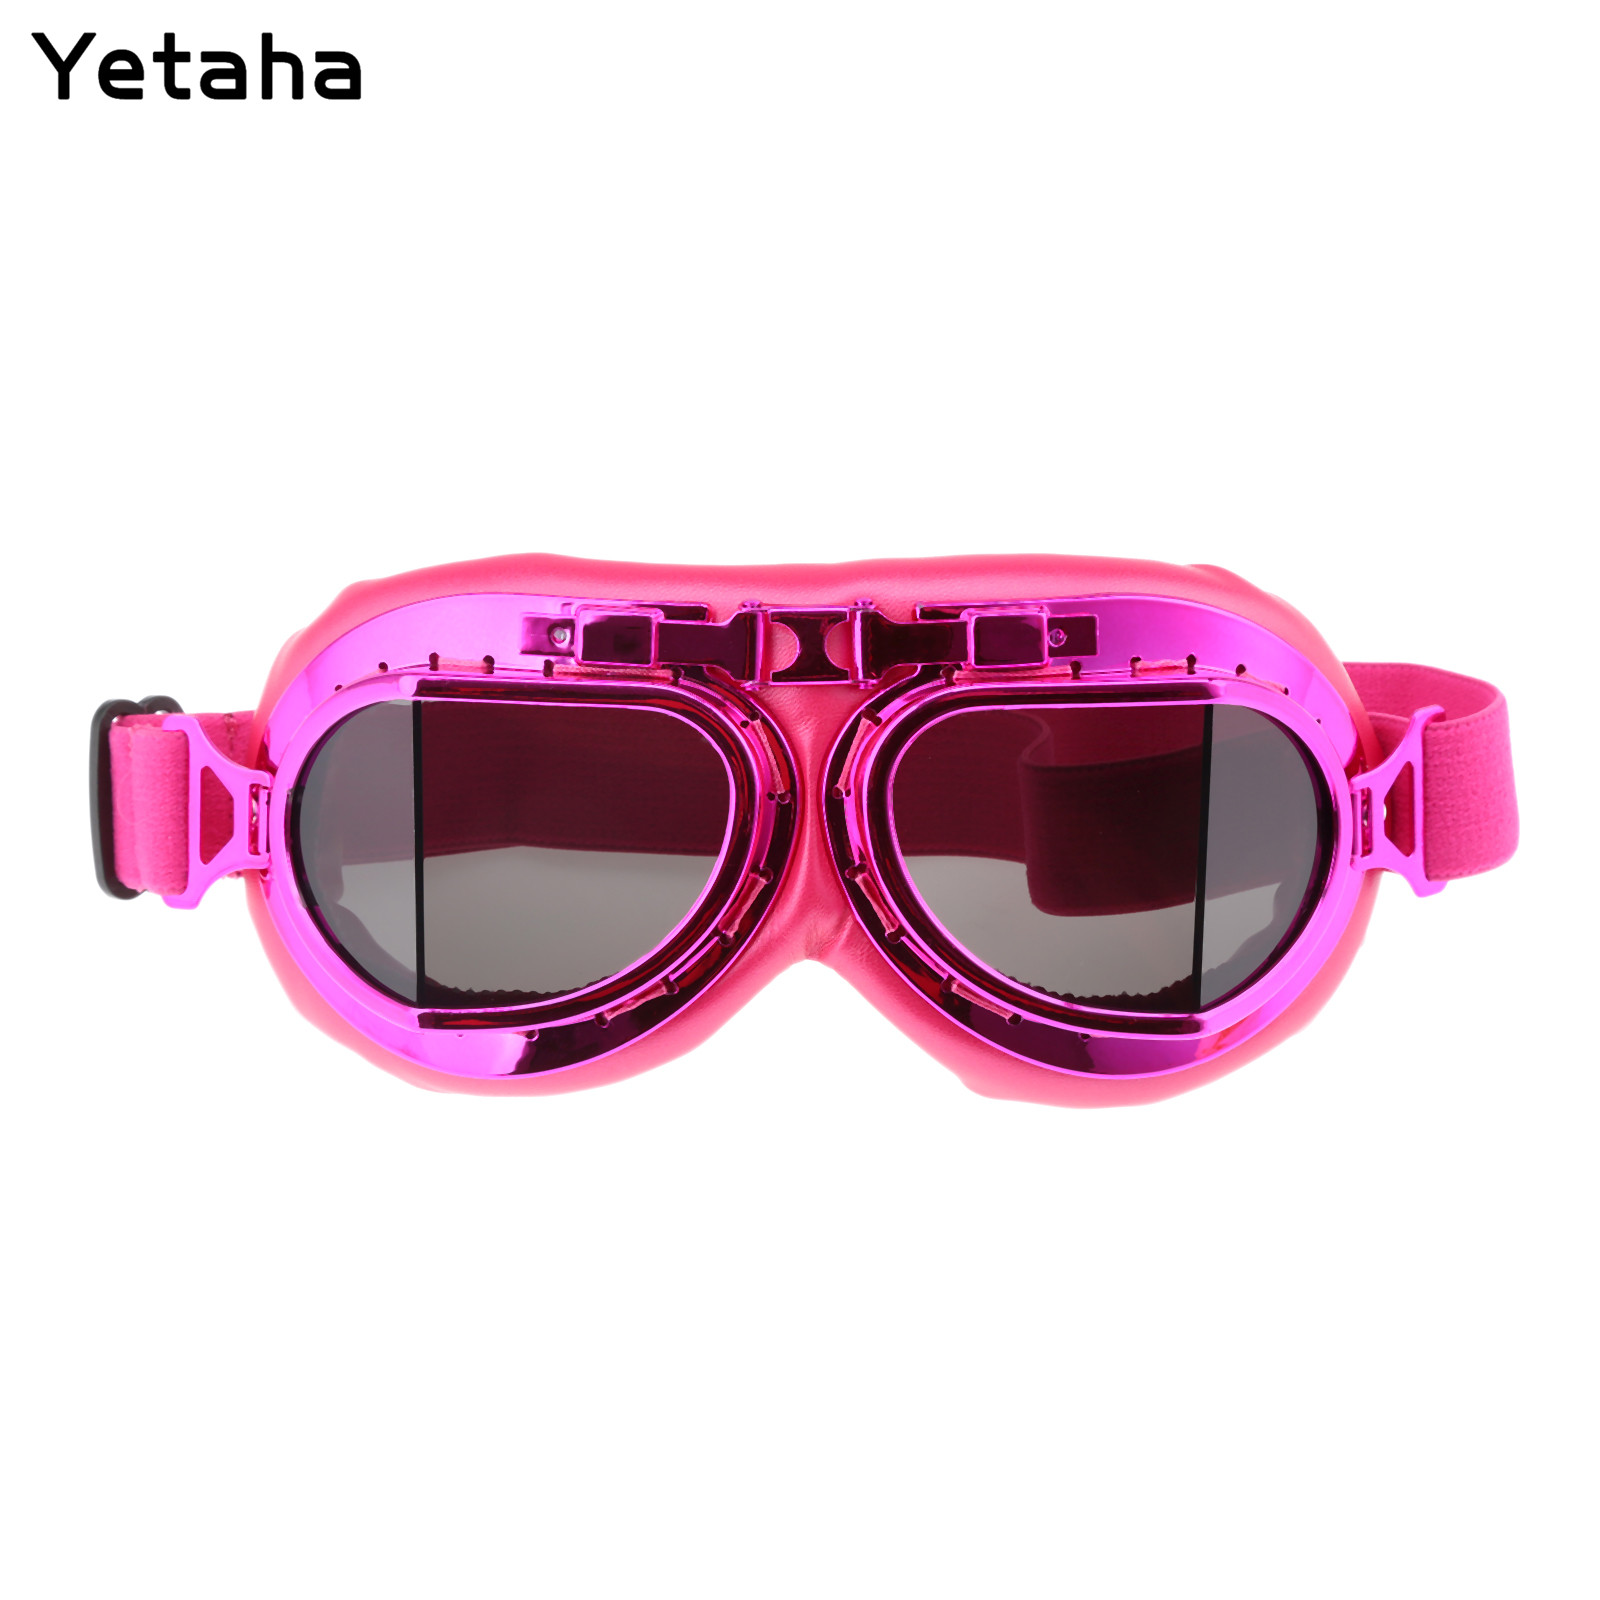 Yellow Motorcycle Glasses UV Protective Sandproof Retro Jet Aviator Pilot Goggles Motor Bike Reflective UV Protection Goggle